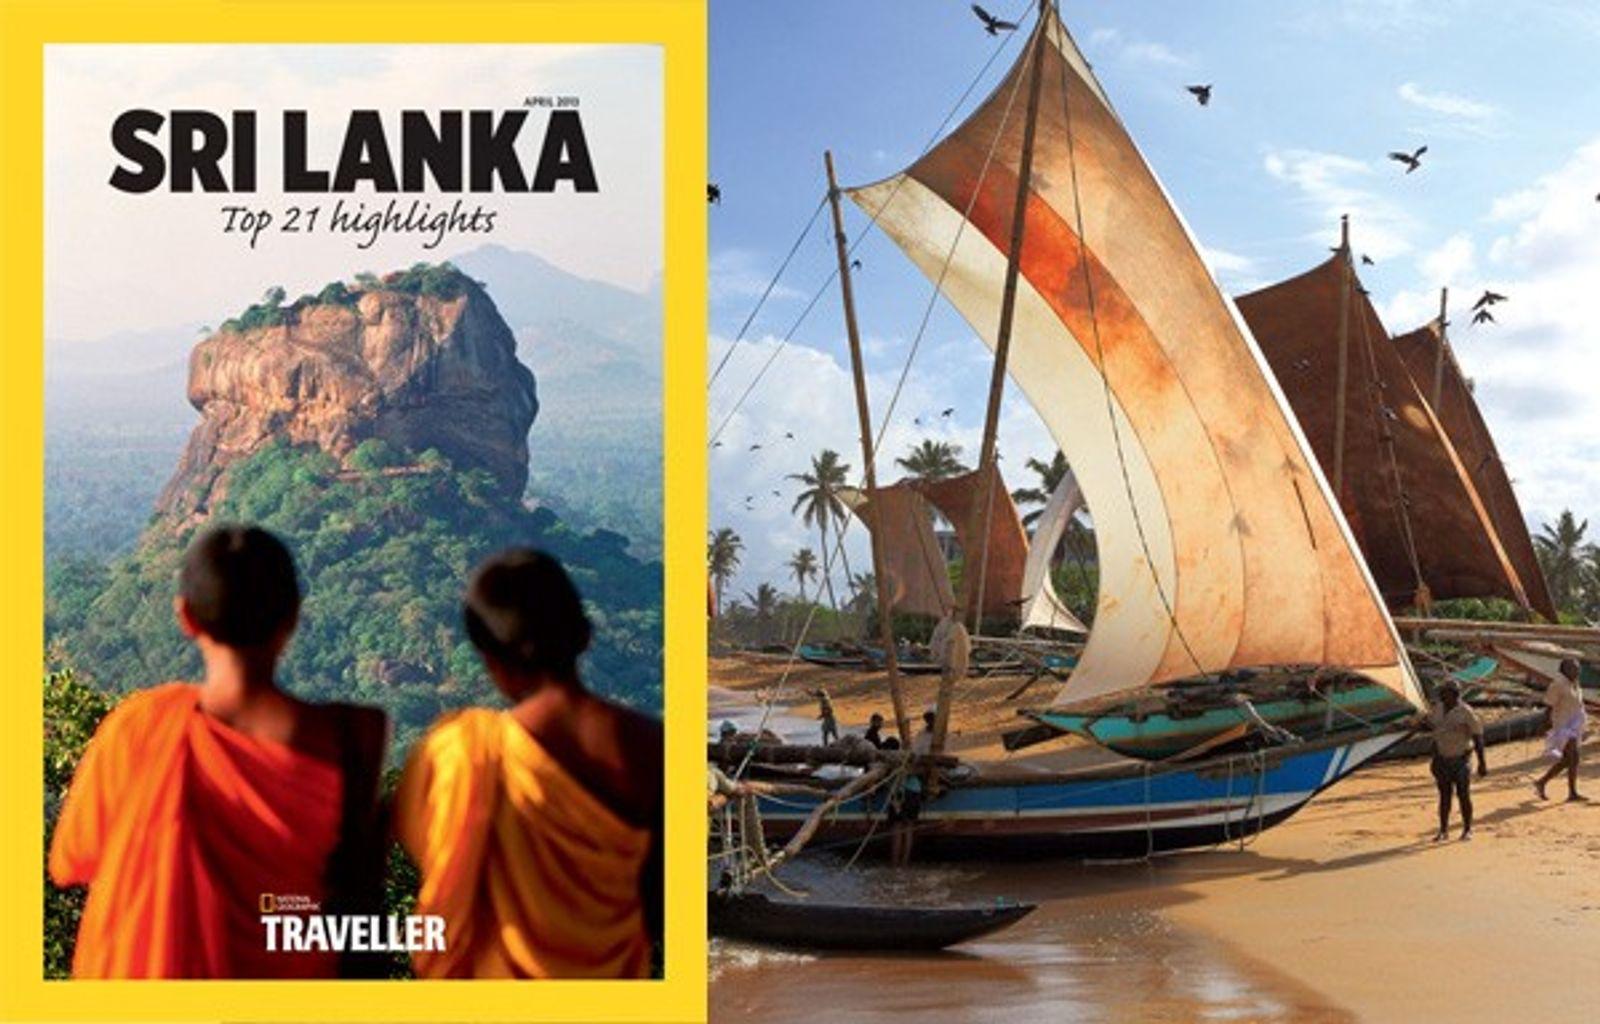 Sri Lanka: Top 21 highlights